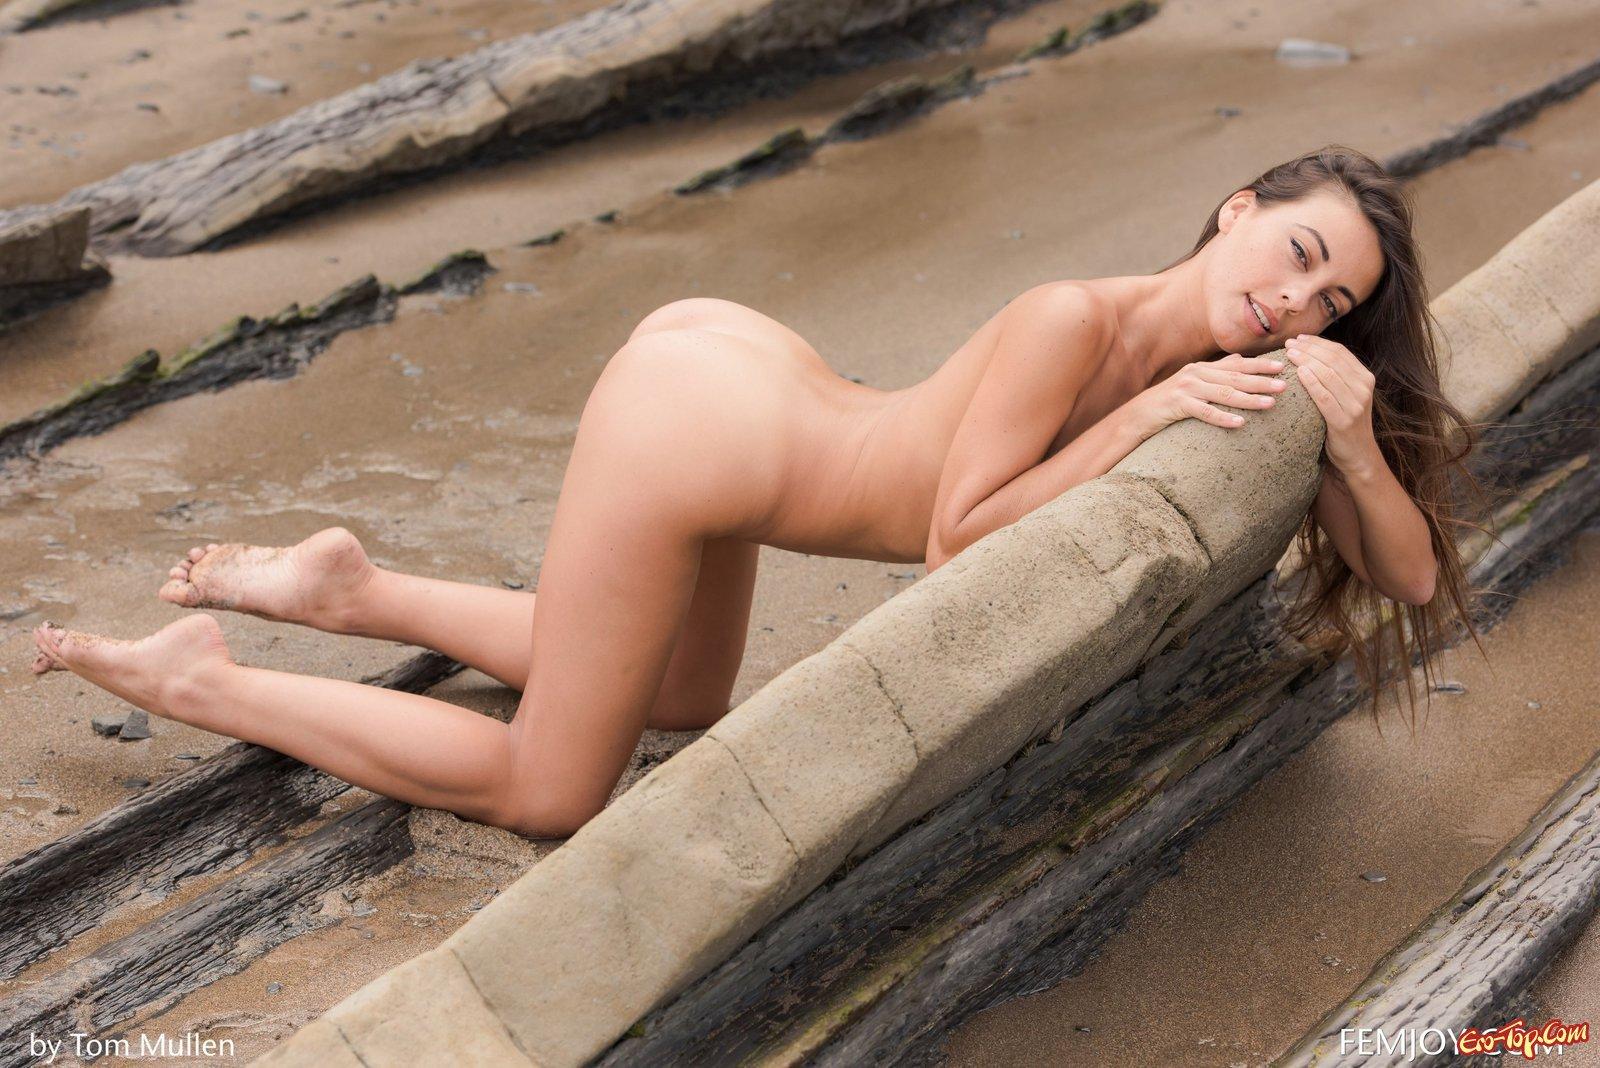 Раздетая сучка обнажила супер туловище в безлюдном месте секс фото